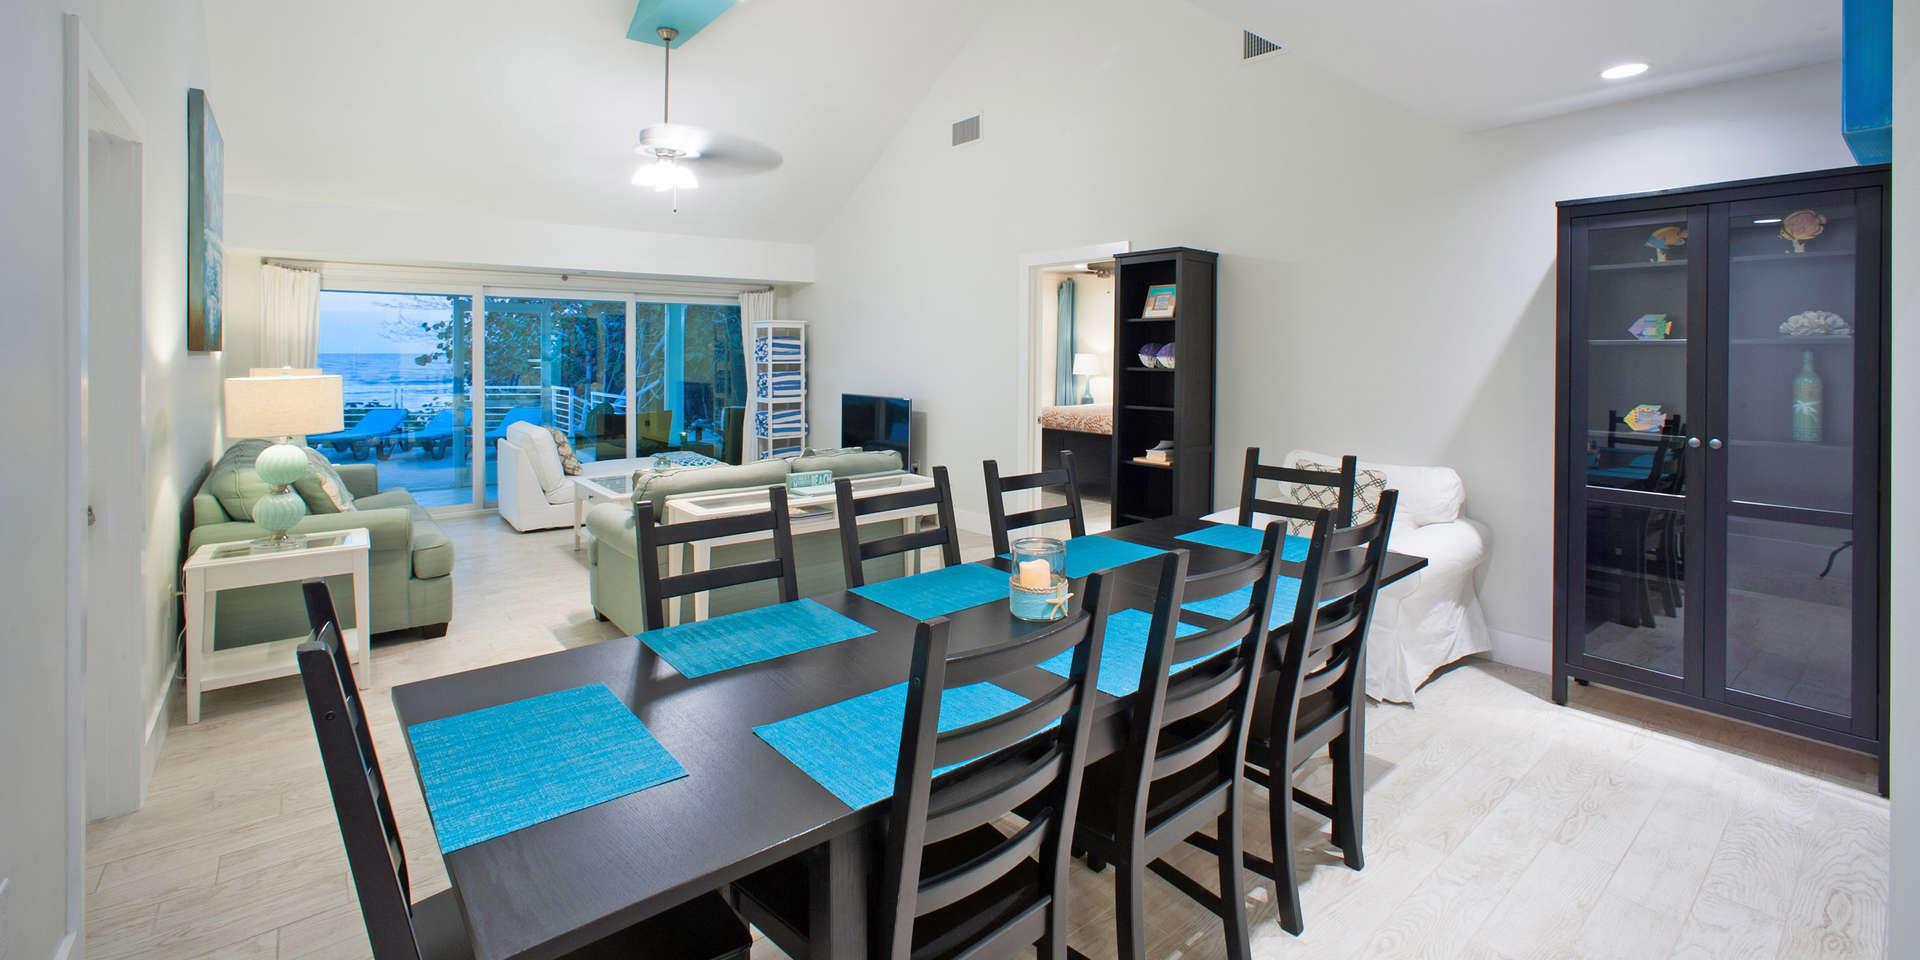 Luxury villa rentals caribbean - Cayman islands - Grand cayman - North side - Calypso Blue Villa - Image 1/17